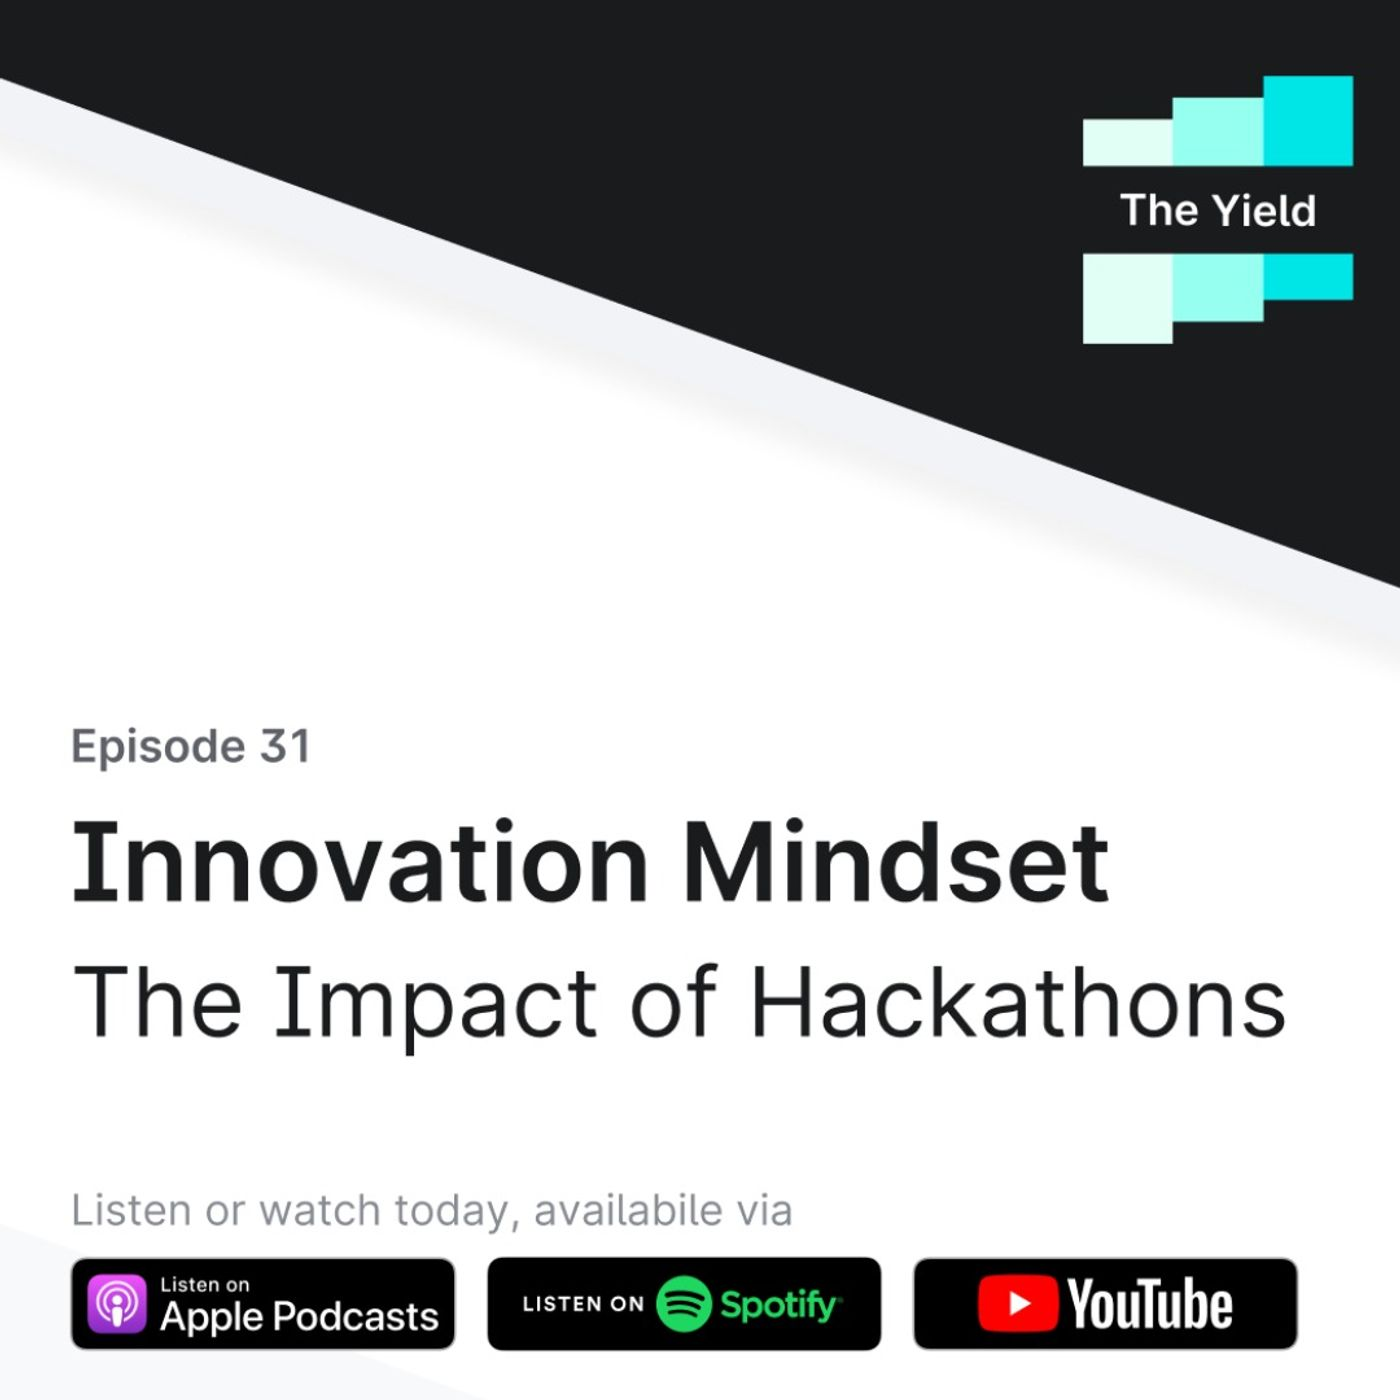 Innovation Mindset: The Impact of Hackathons